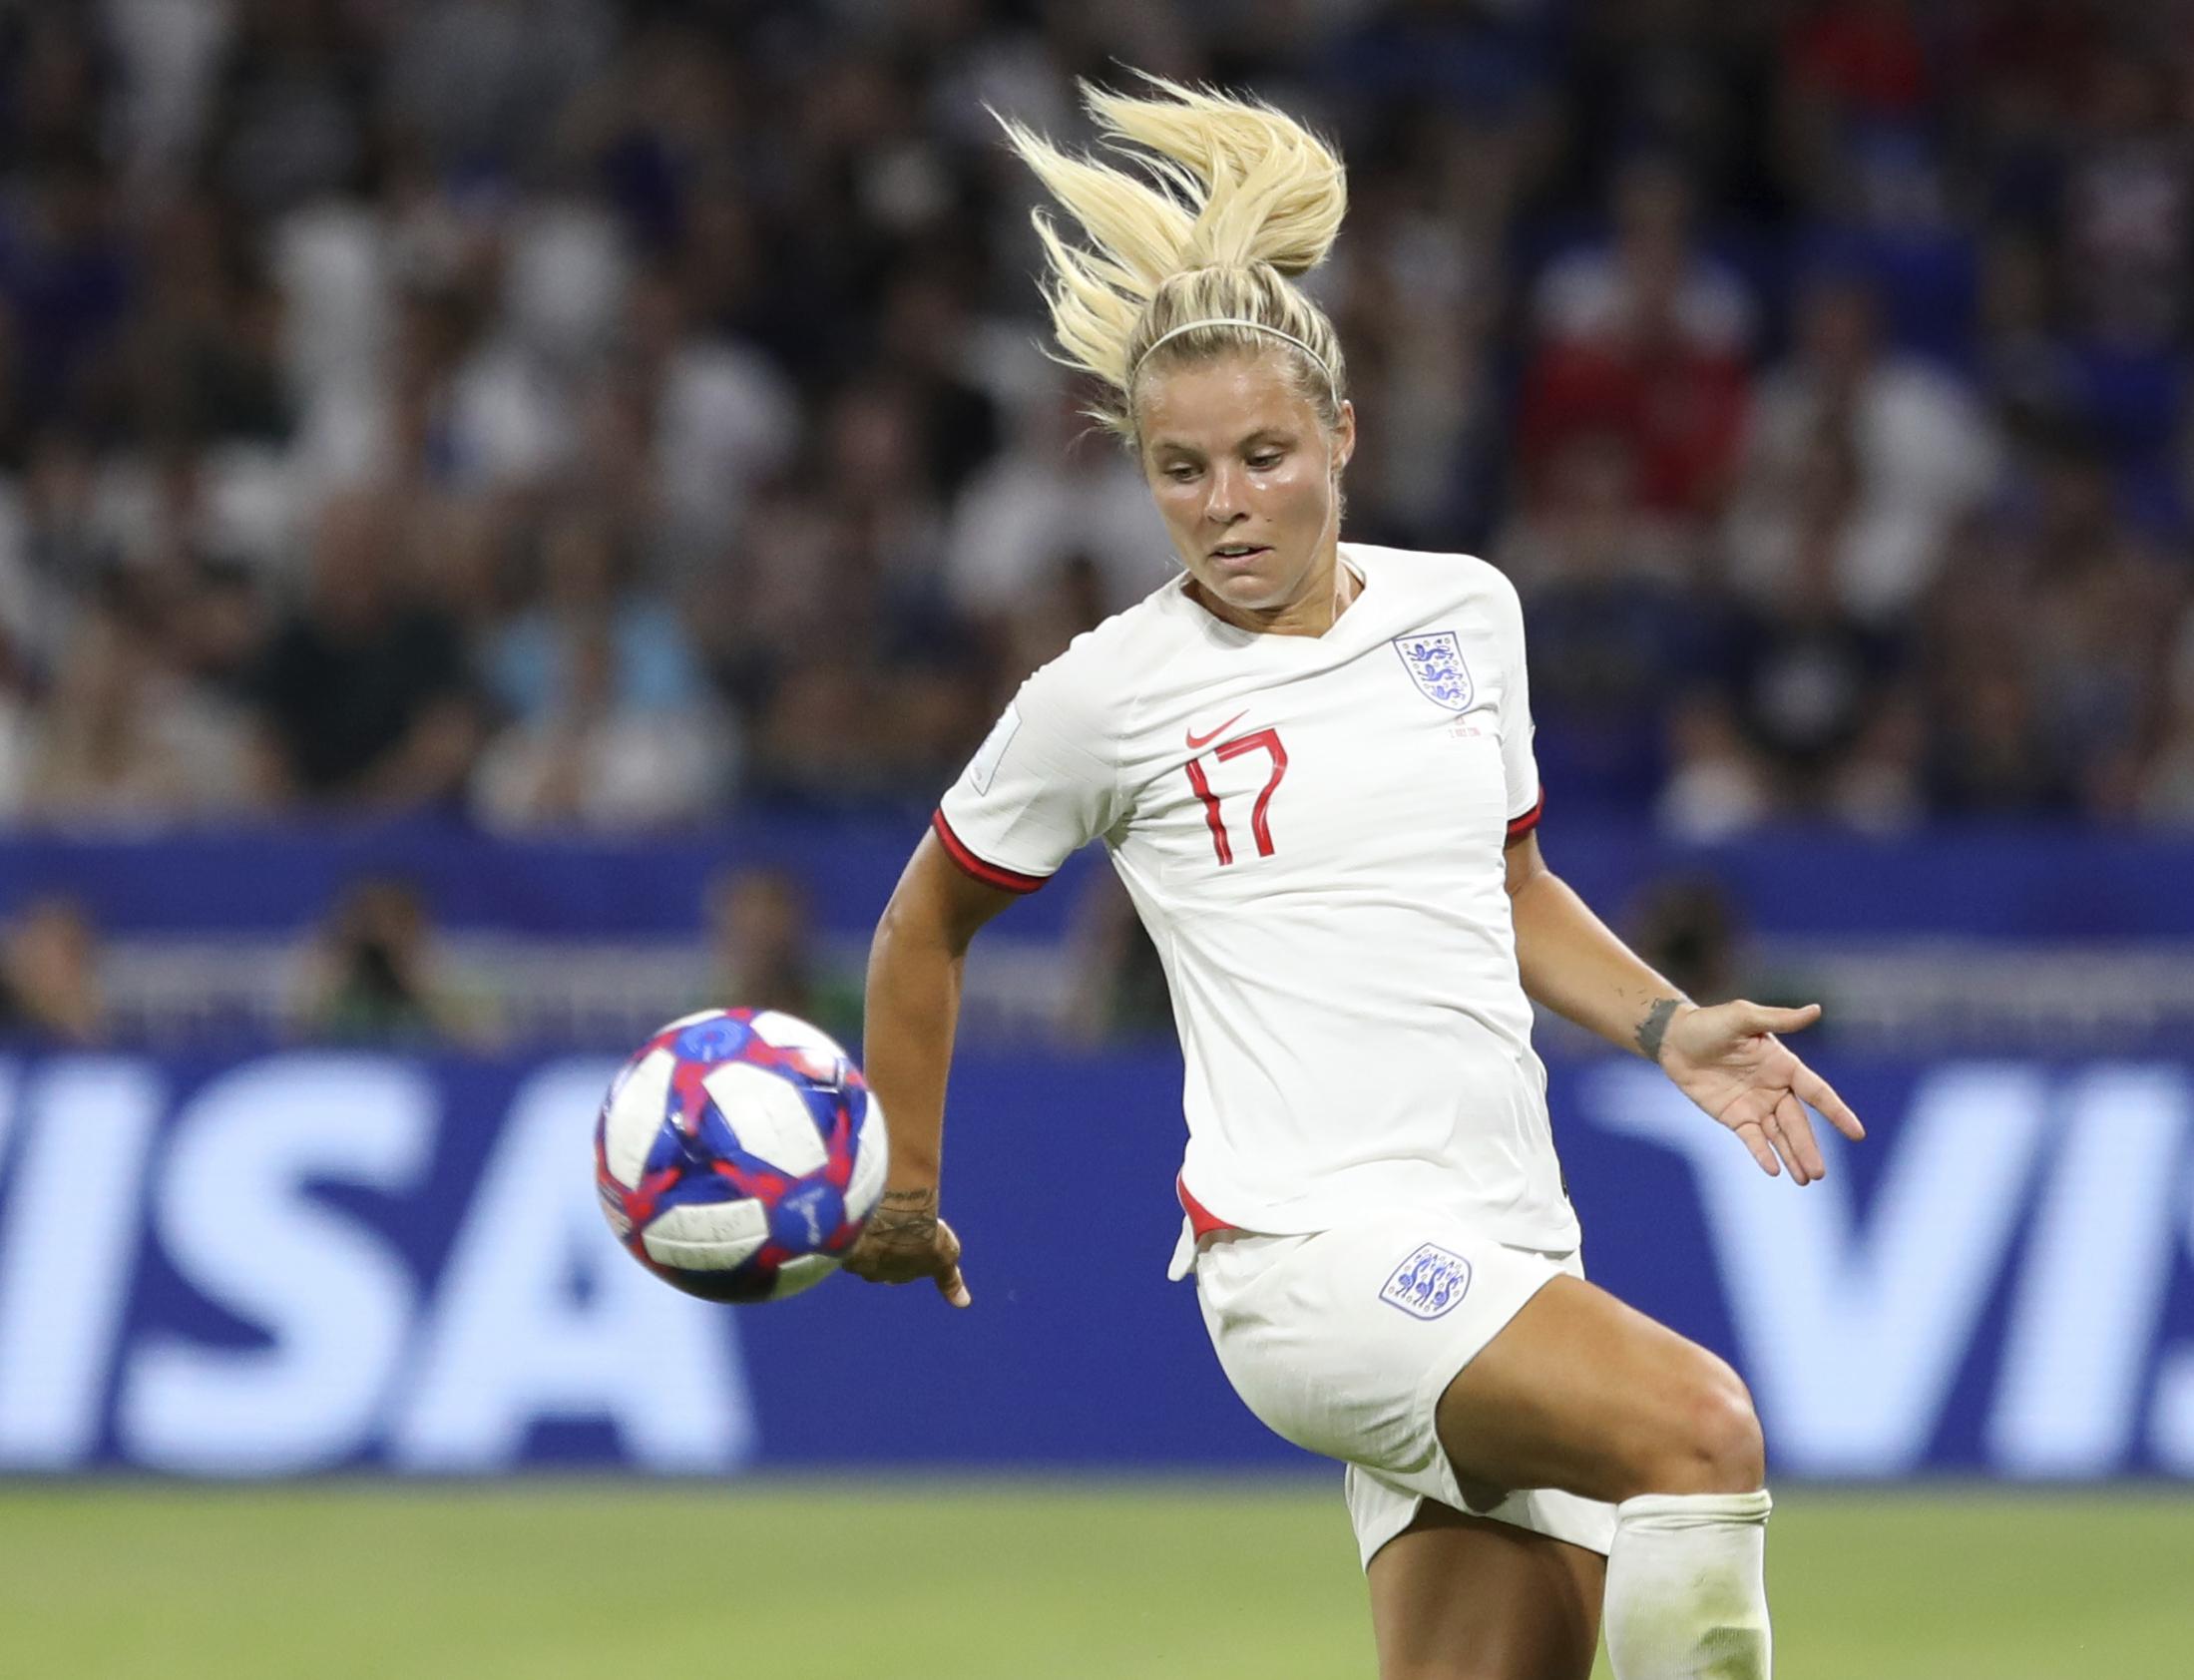 watch sweden vs england live stream free